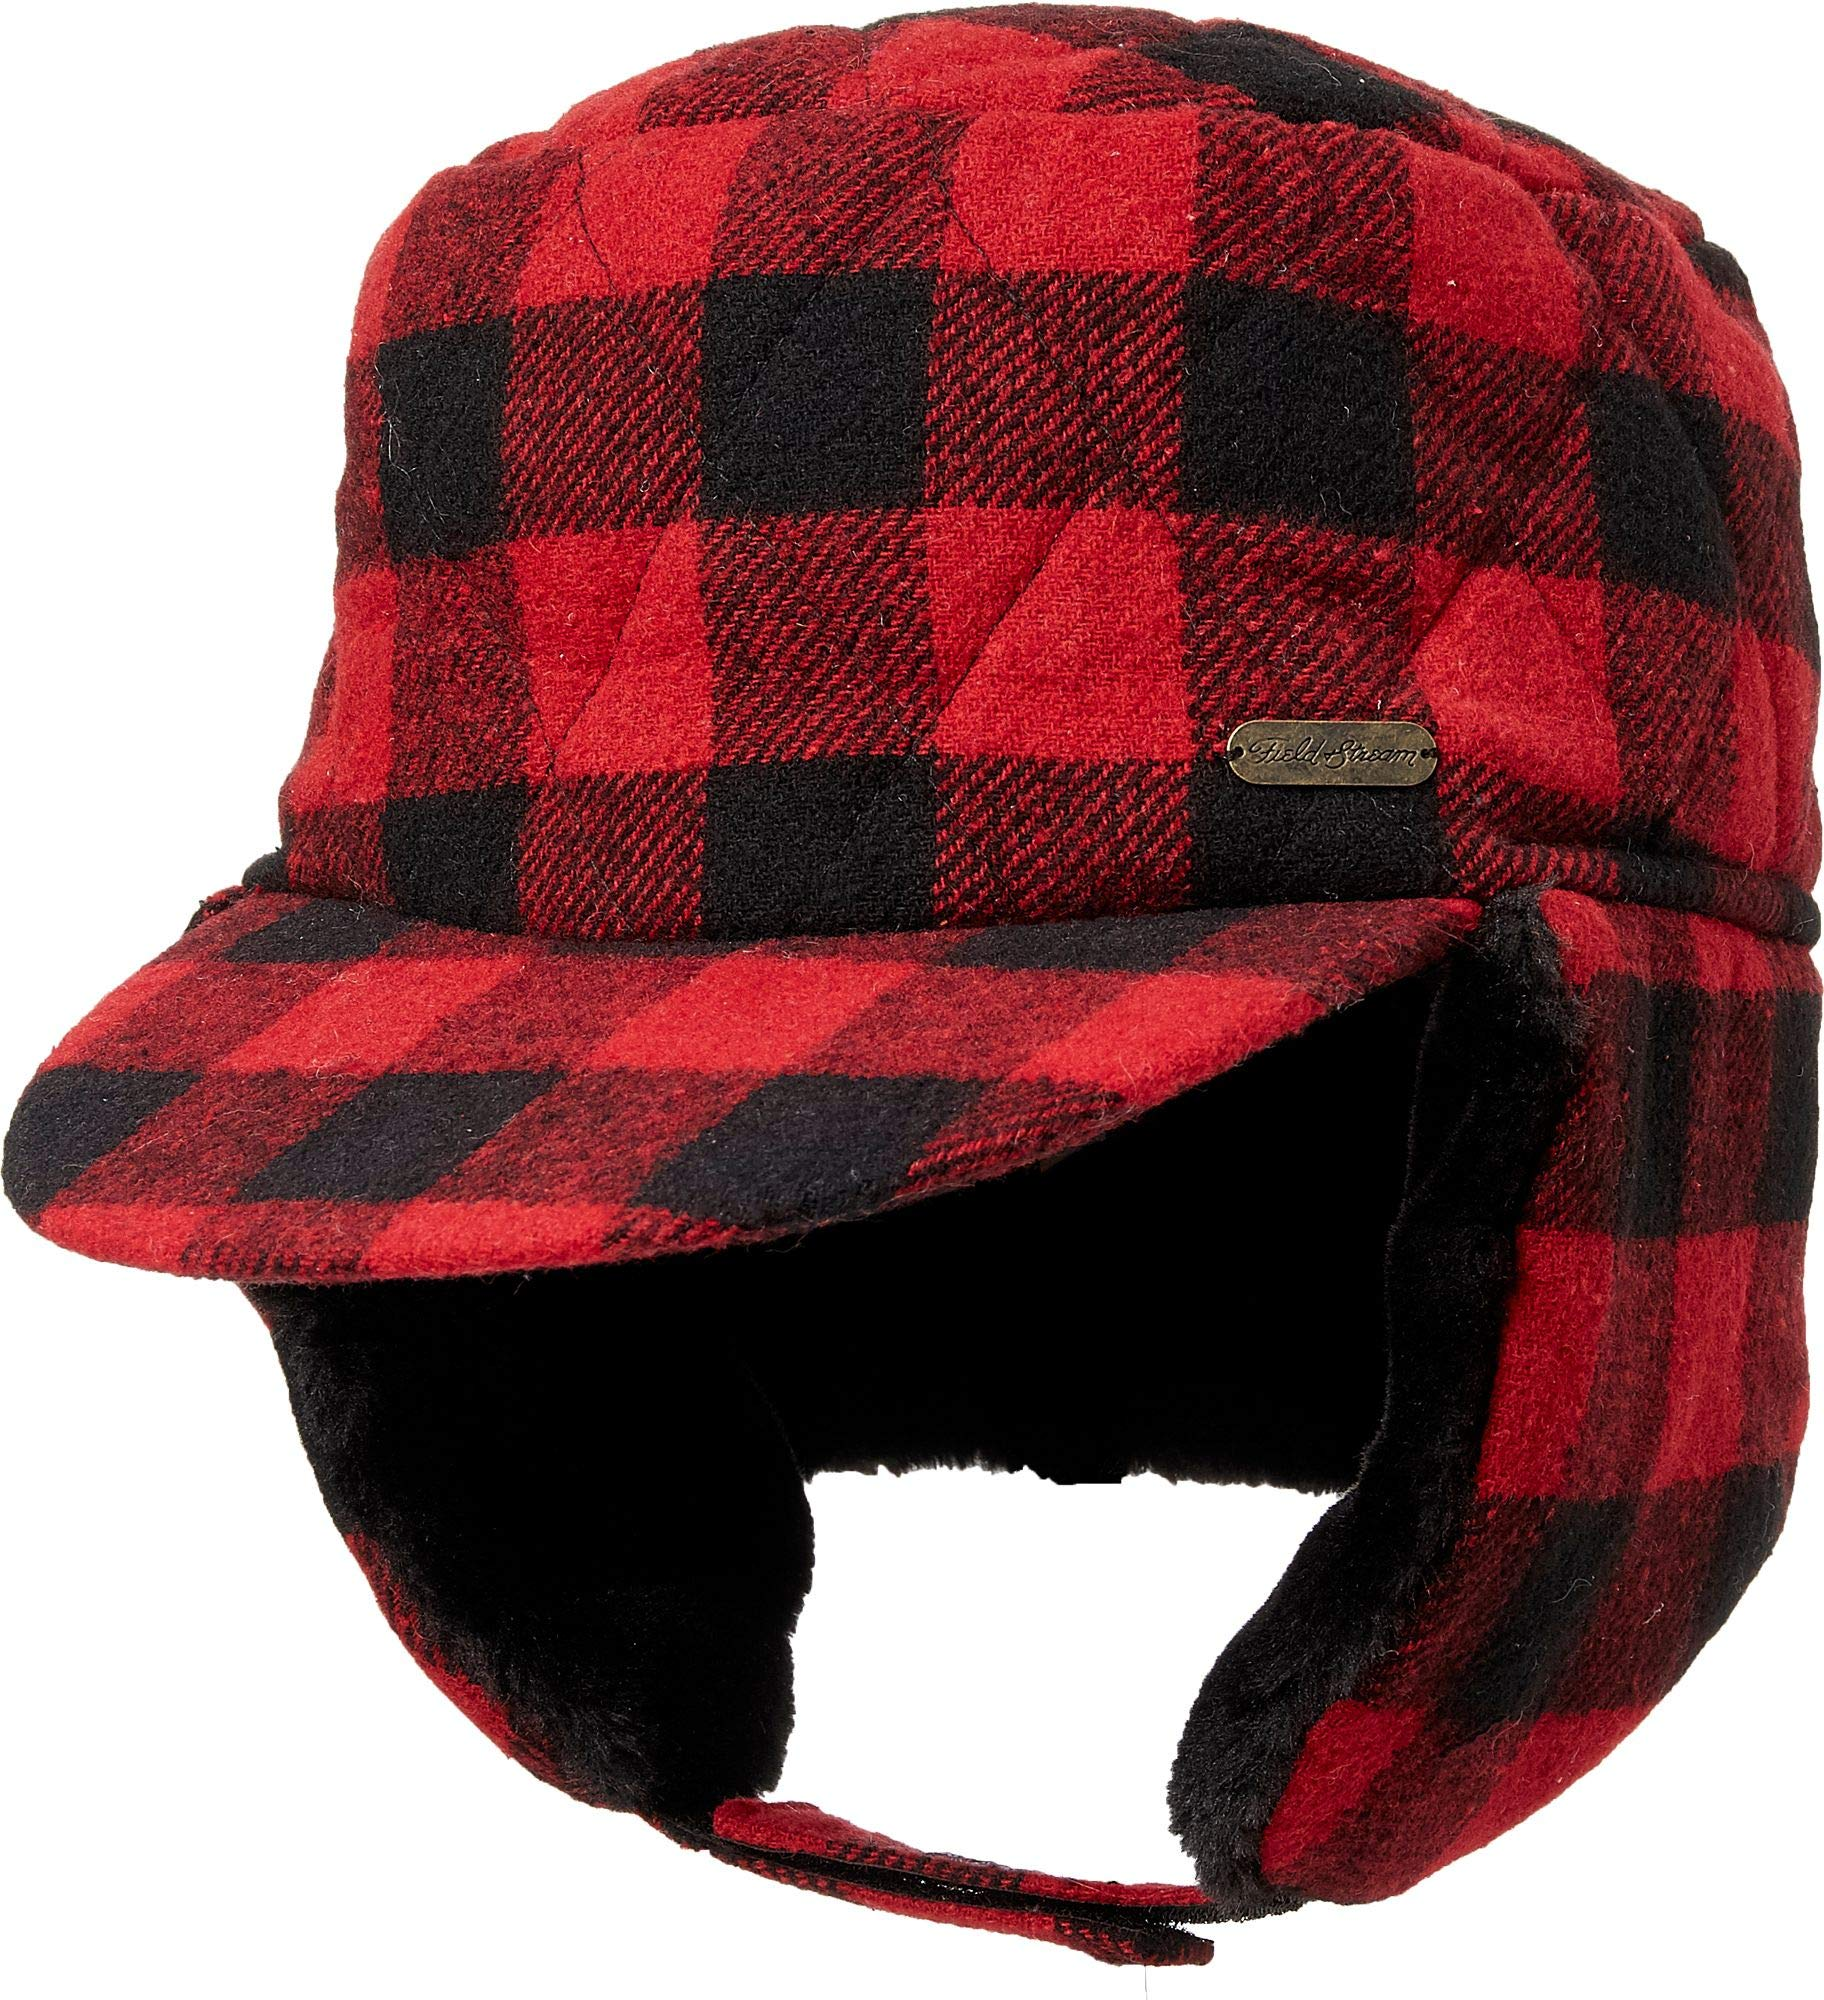 Field & Stream Men's Ear Flap Trapper Hat (Red, Medium/Large)